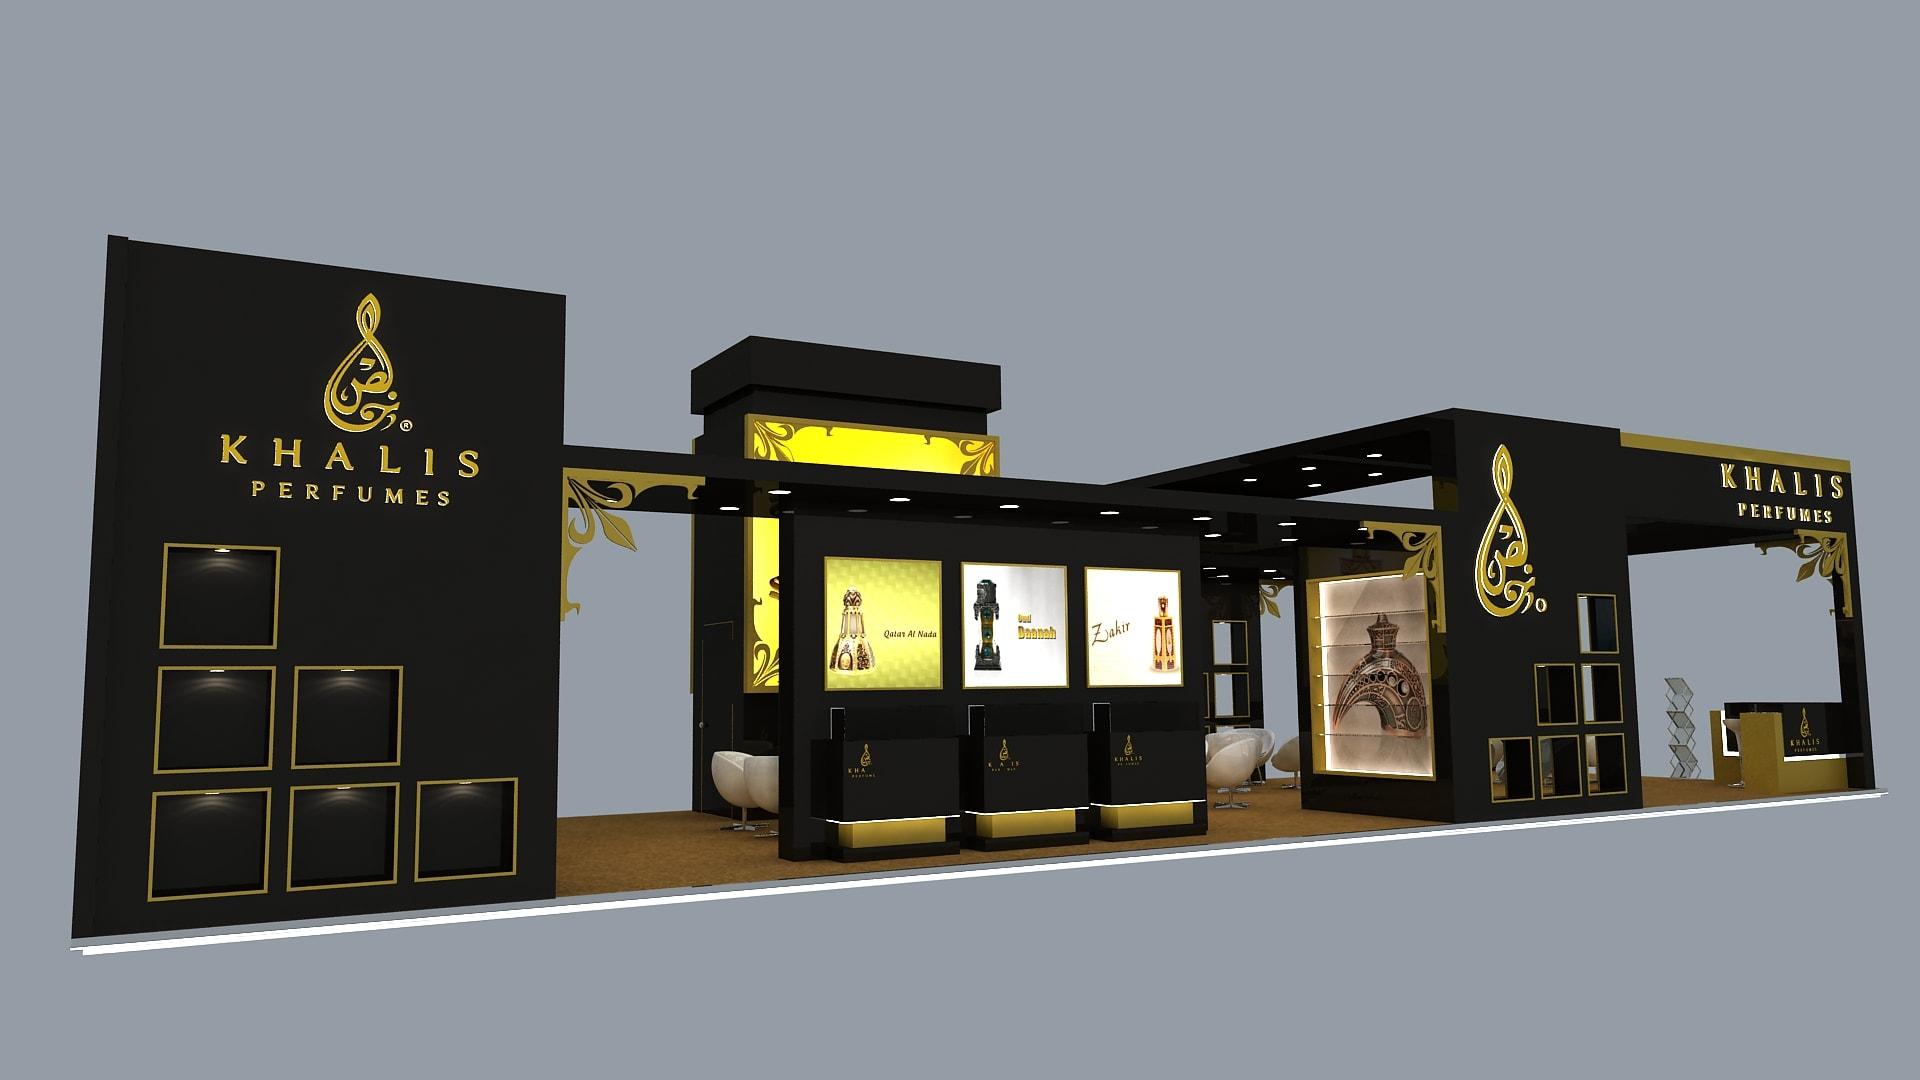 khalis perfume exhibition stand design in uae